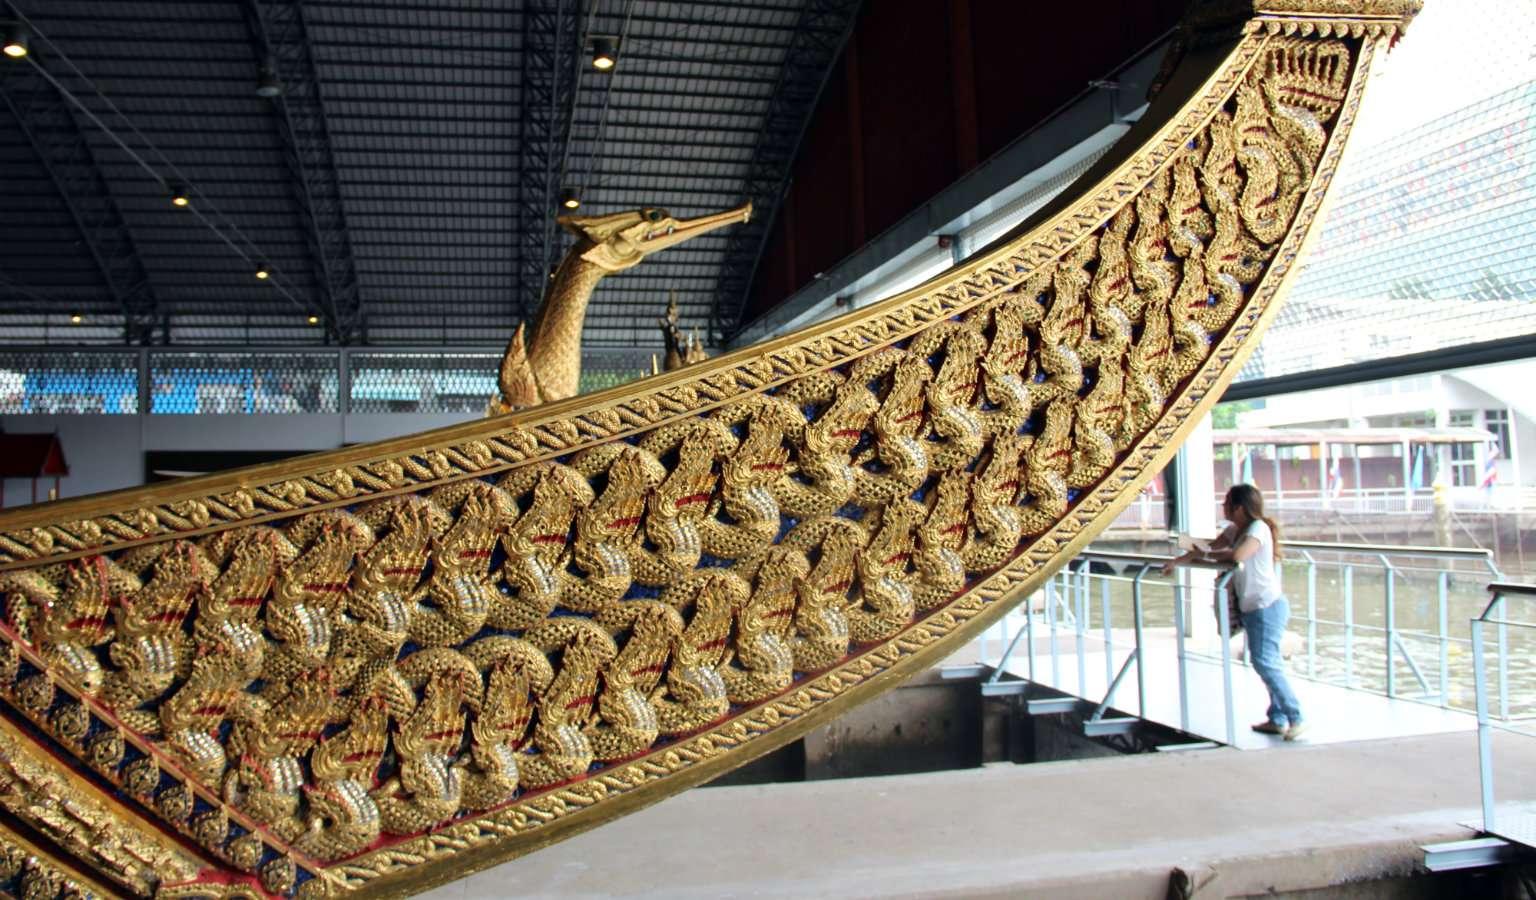 De Koninklijke sloep van Anekchat Puchong in het National Museum of Royal Barges in Bangkok